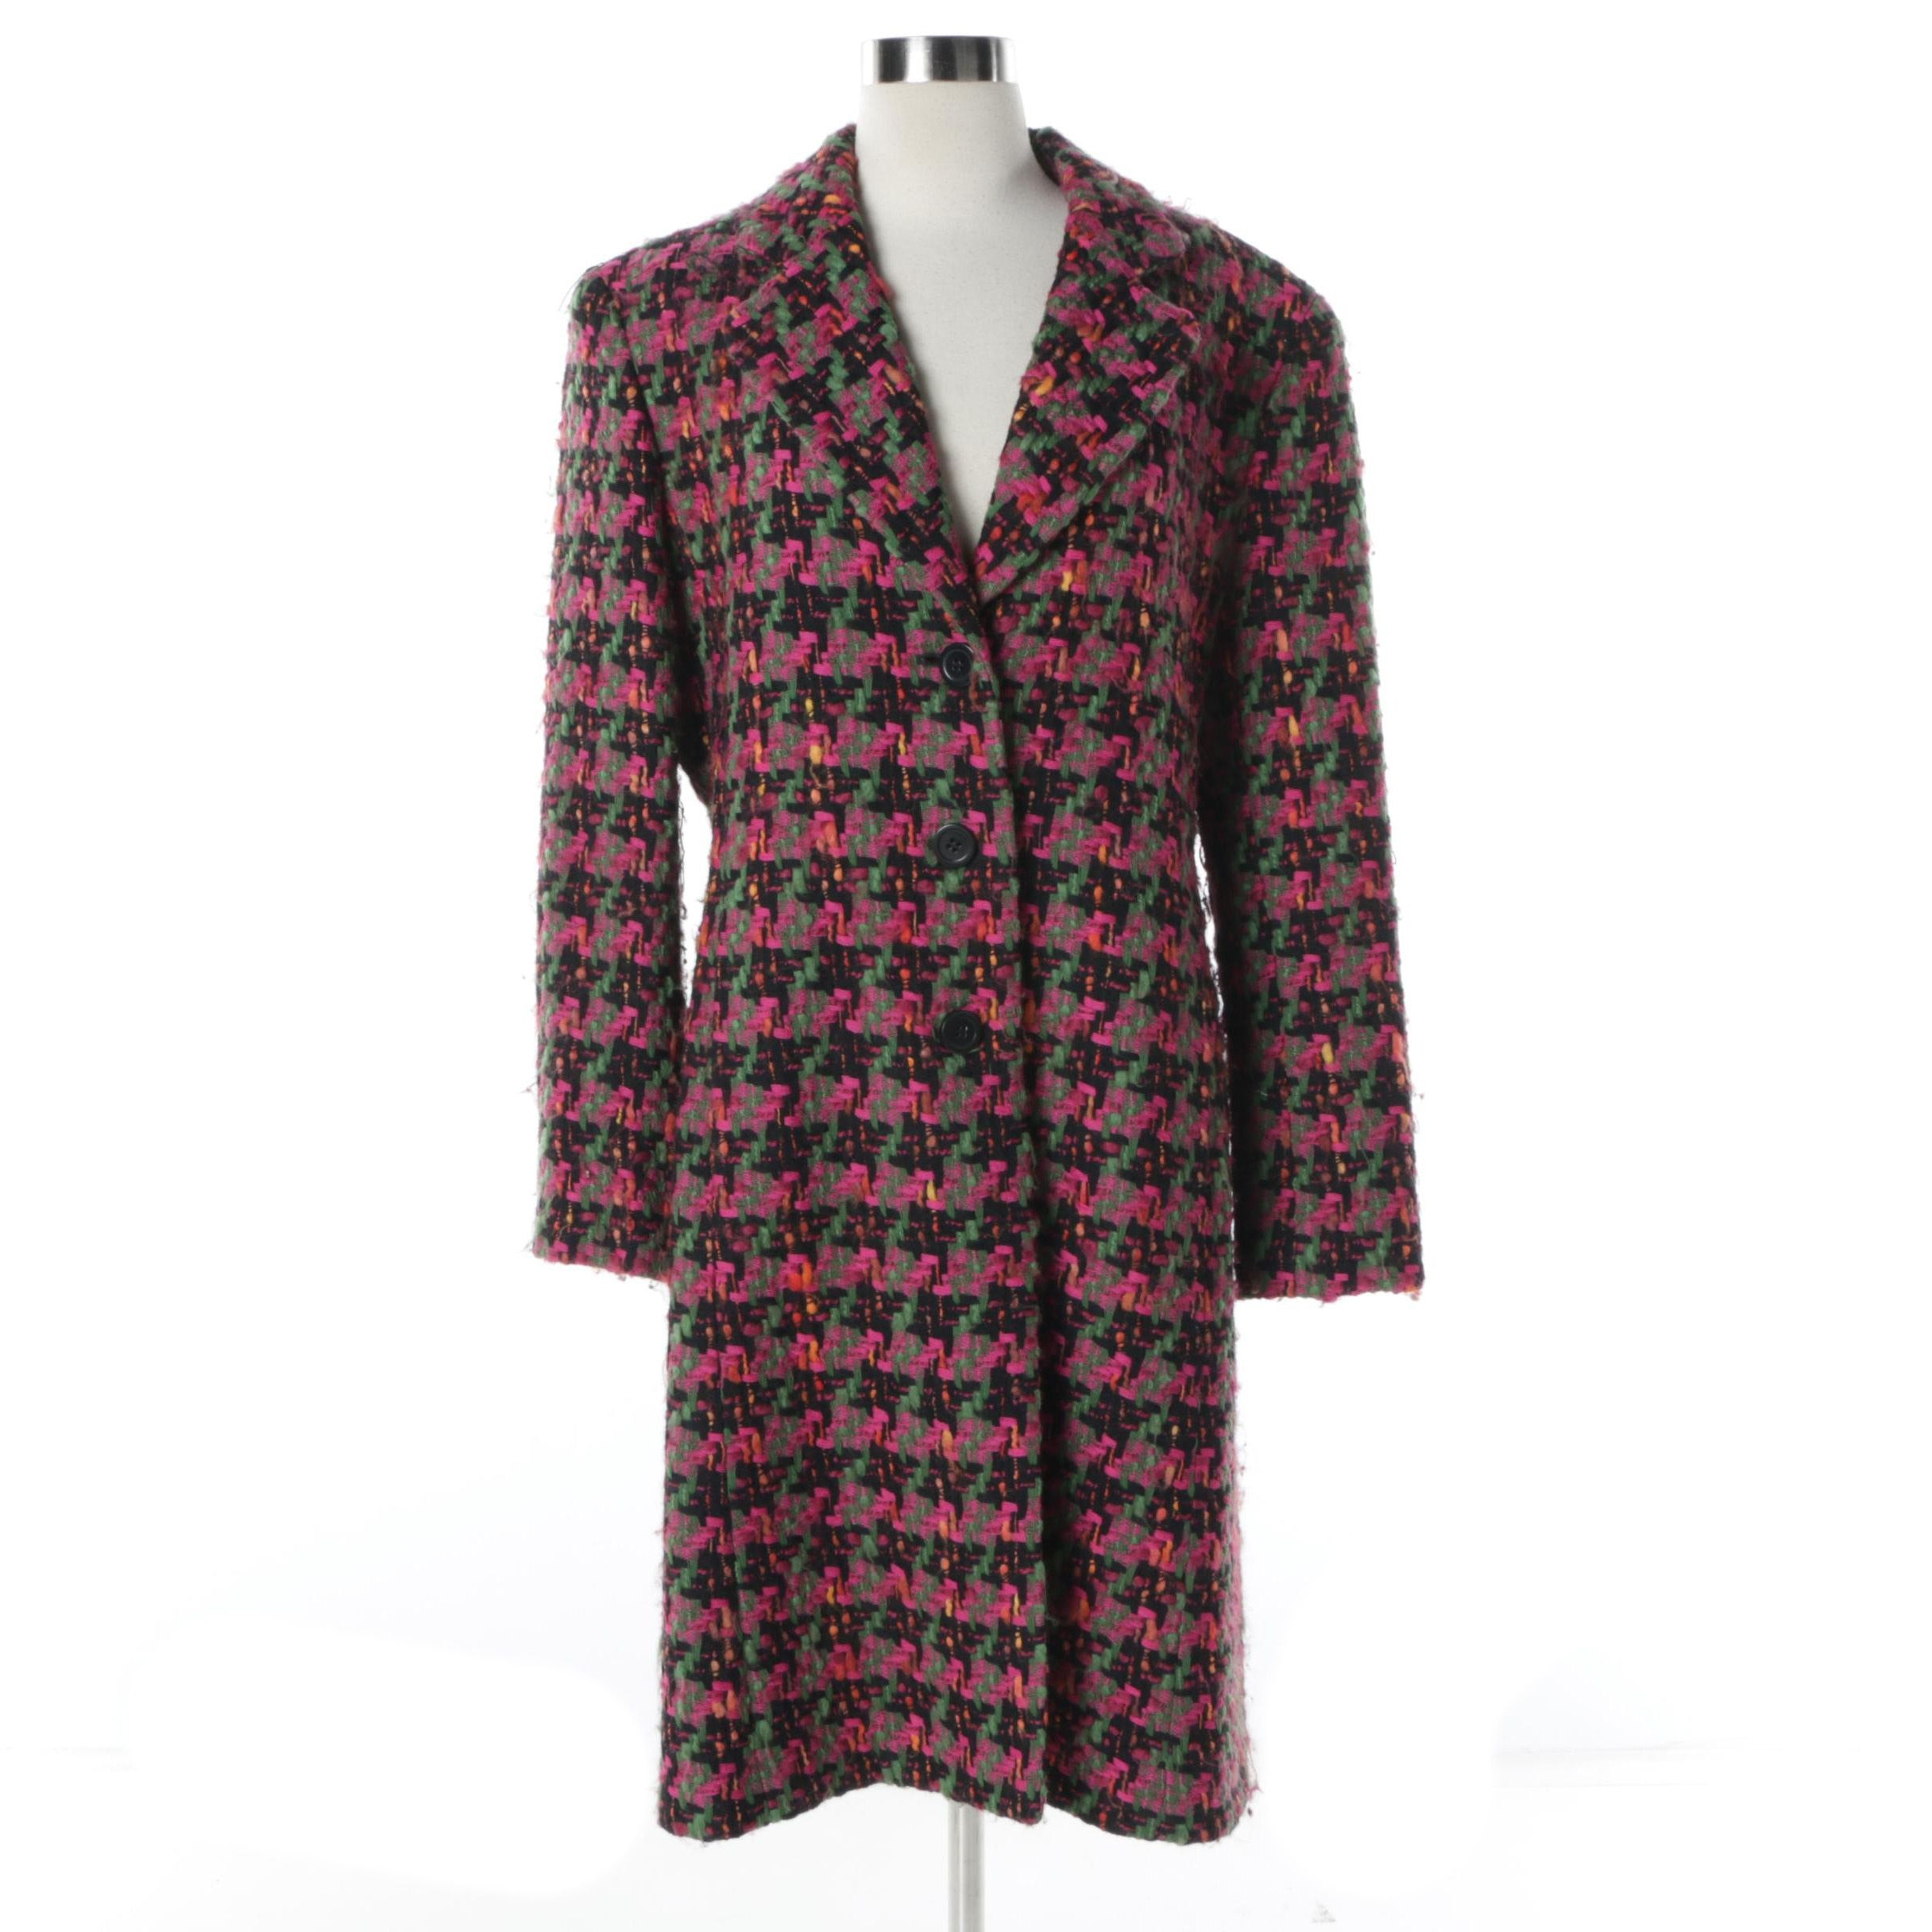 Women's Jones New York Multicolored Wool Blend Knit Button-Front Car Coat